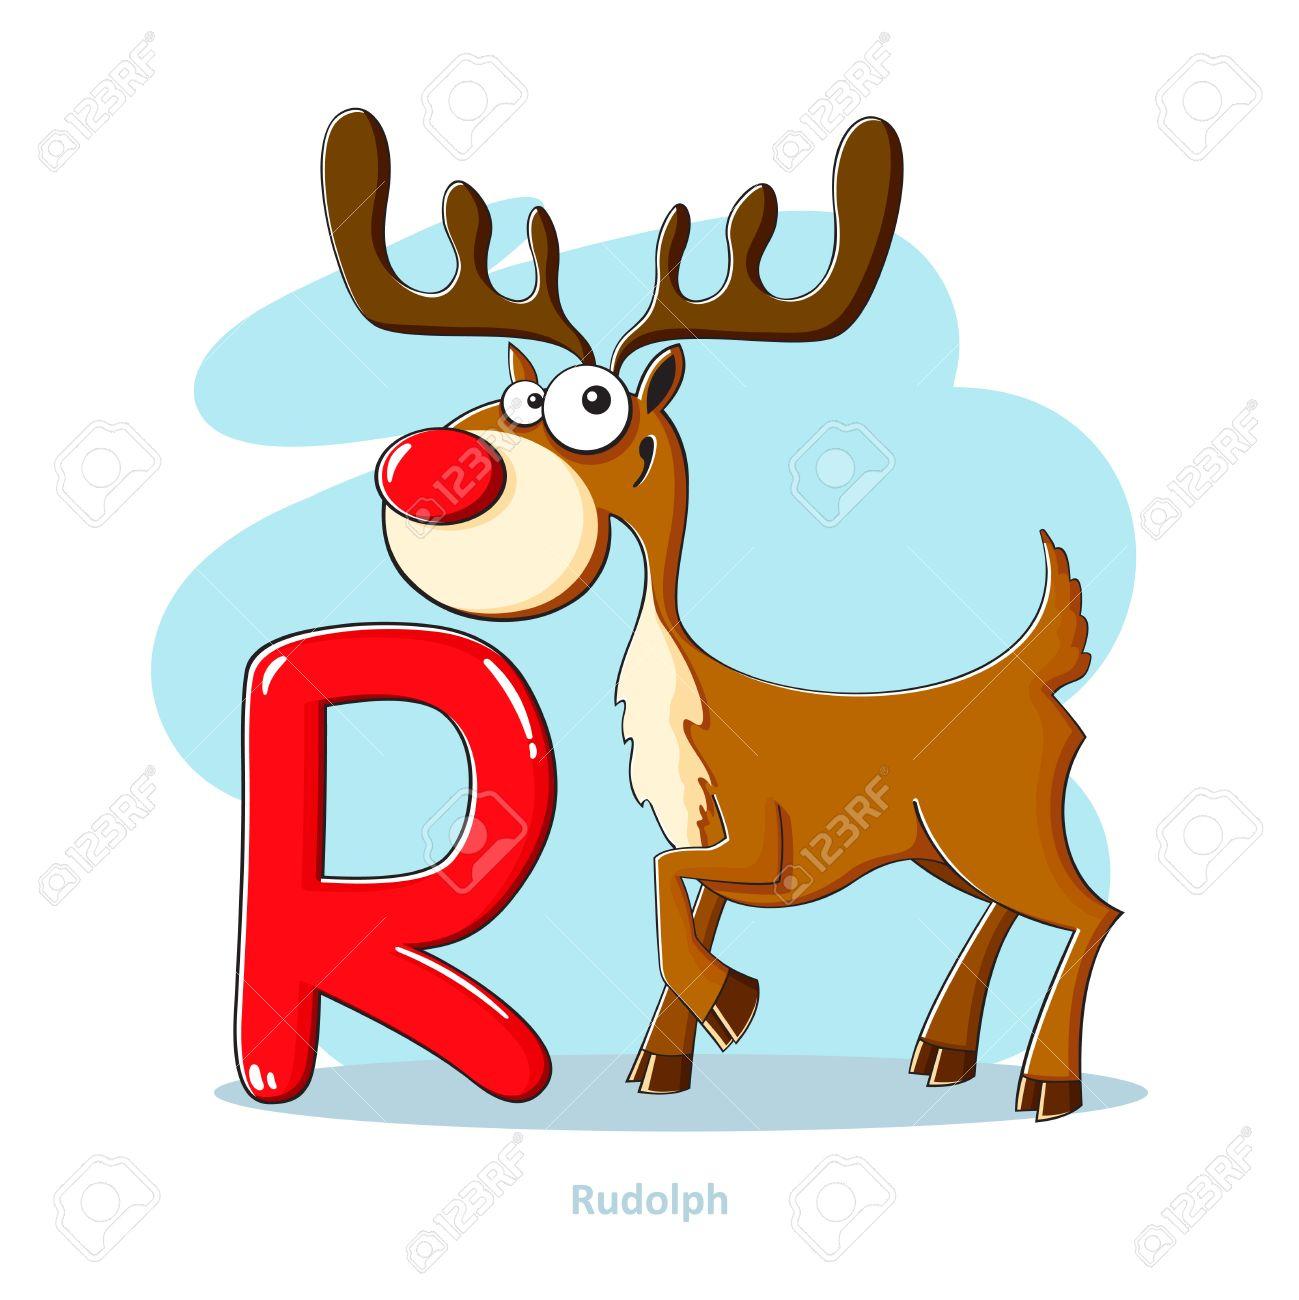 Cartoons alphabet letter r with funny rudolph royalty free banco de imagens cartoons alphabet letter r with funny rudolph altavistaventures Image collections